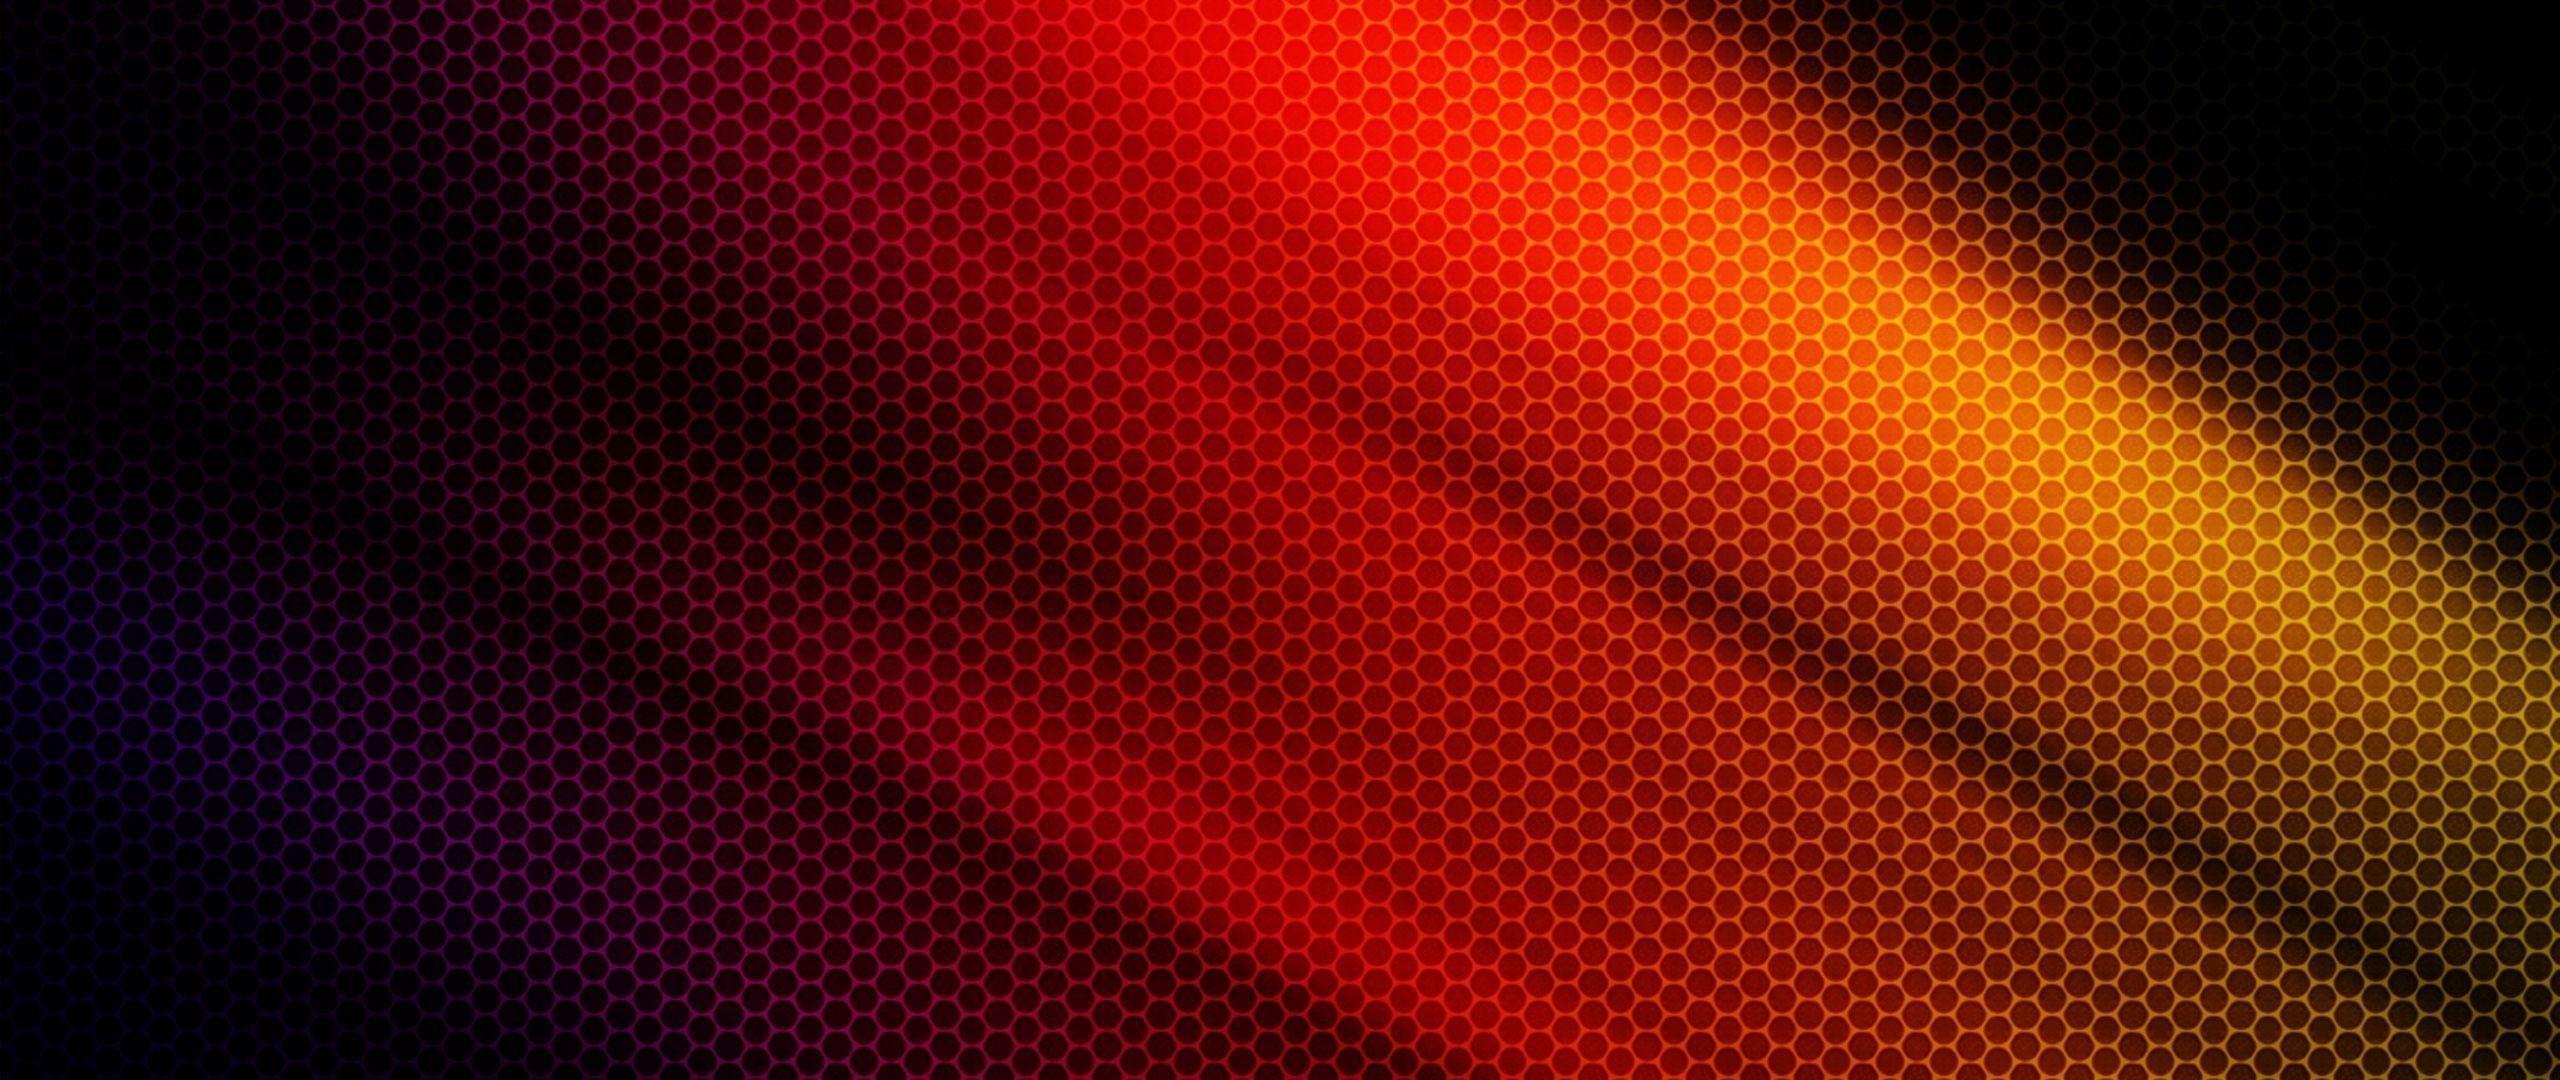 Download Wallpaper Net, Color, Background, Dark .